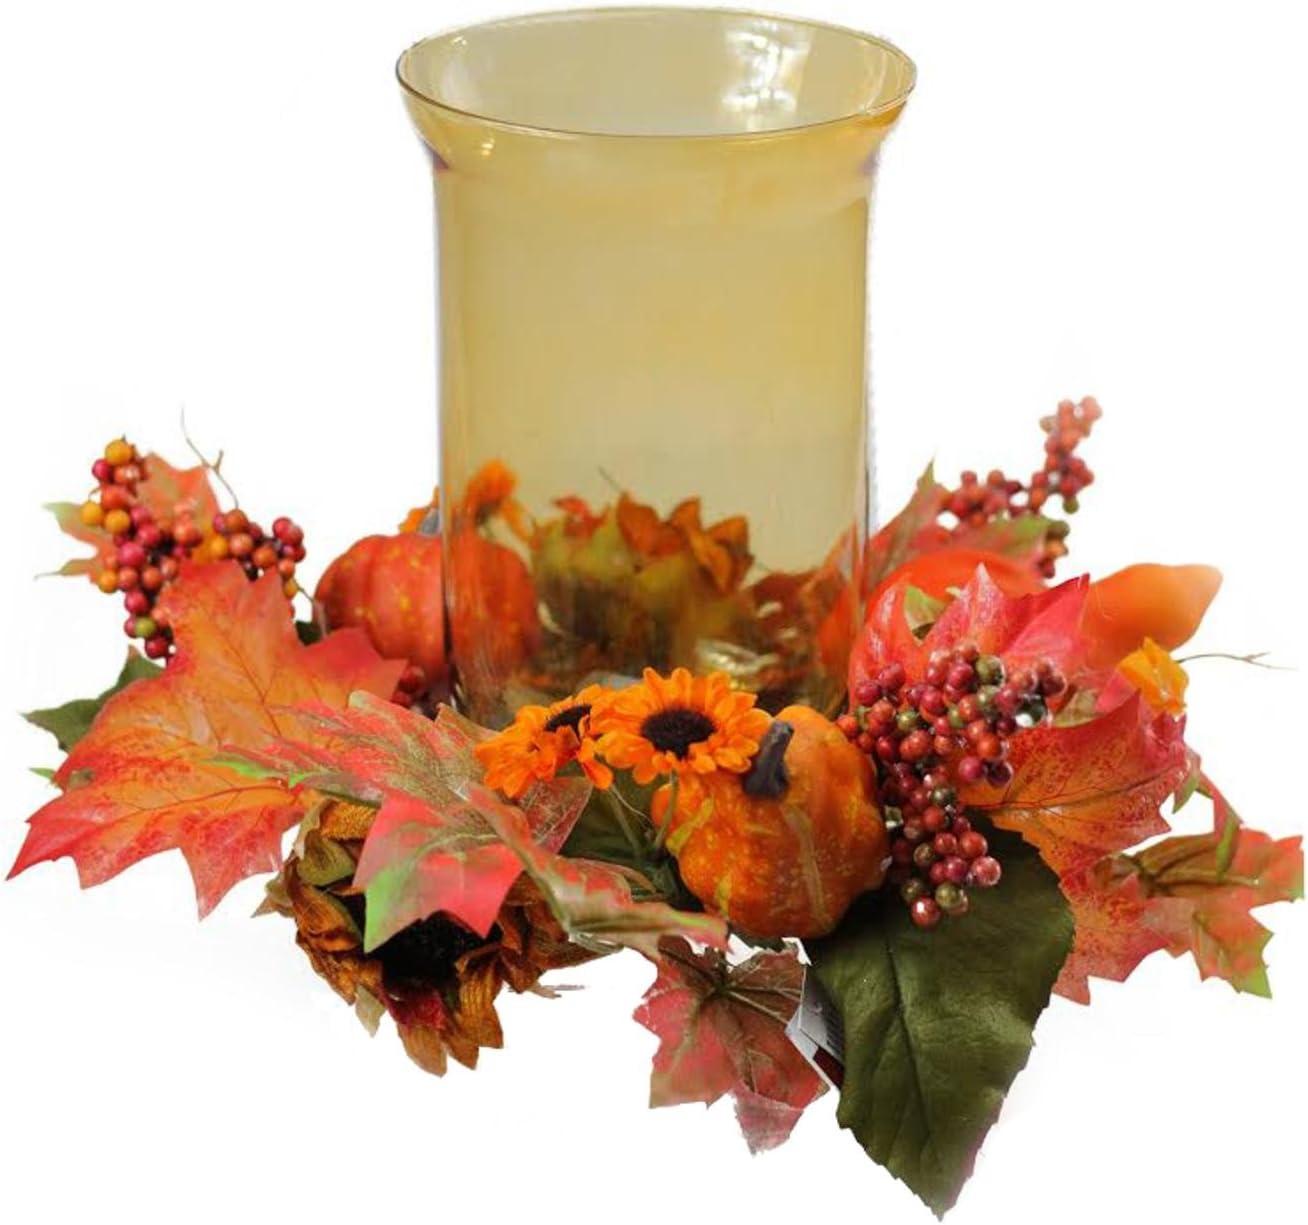 Autumn Plastic Floral Candle Wreath Orange Yellow Red Brown PIllar Candle Wreath Harvest Thanksgiving Decor Floral Plastic Centerpiece